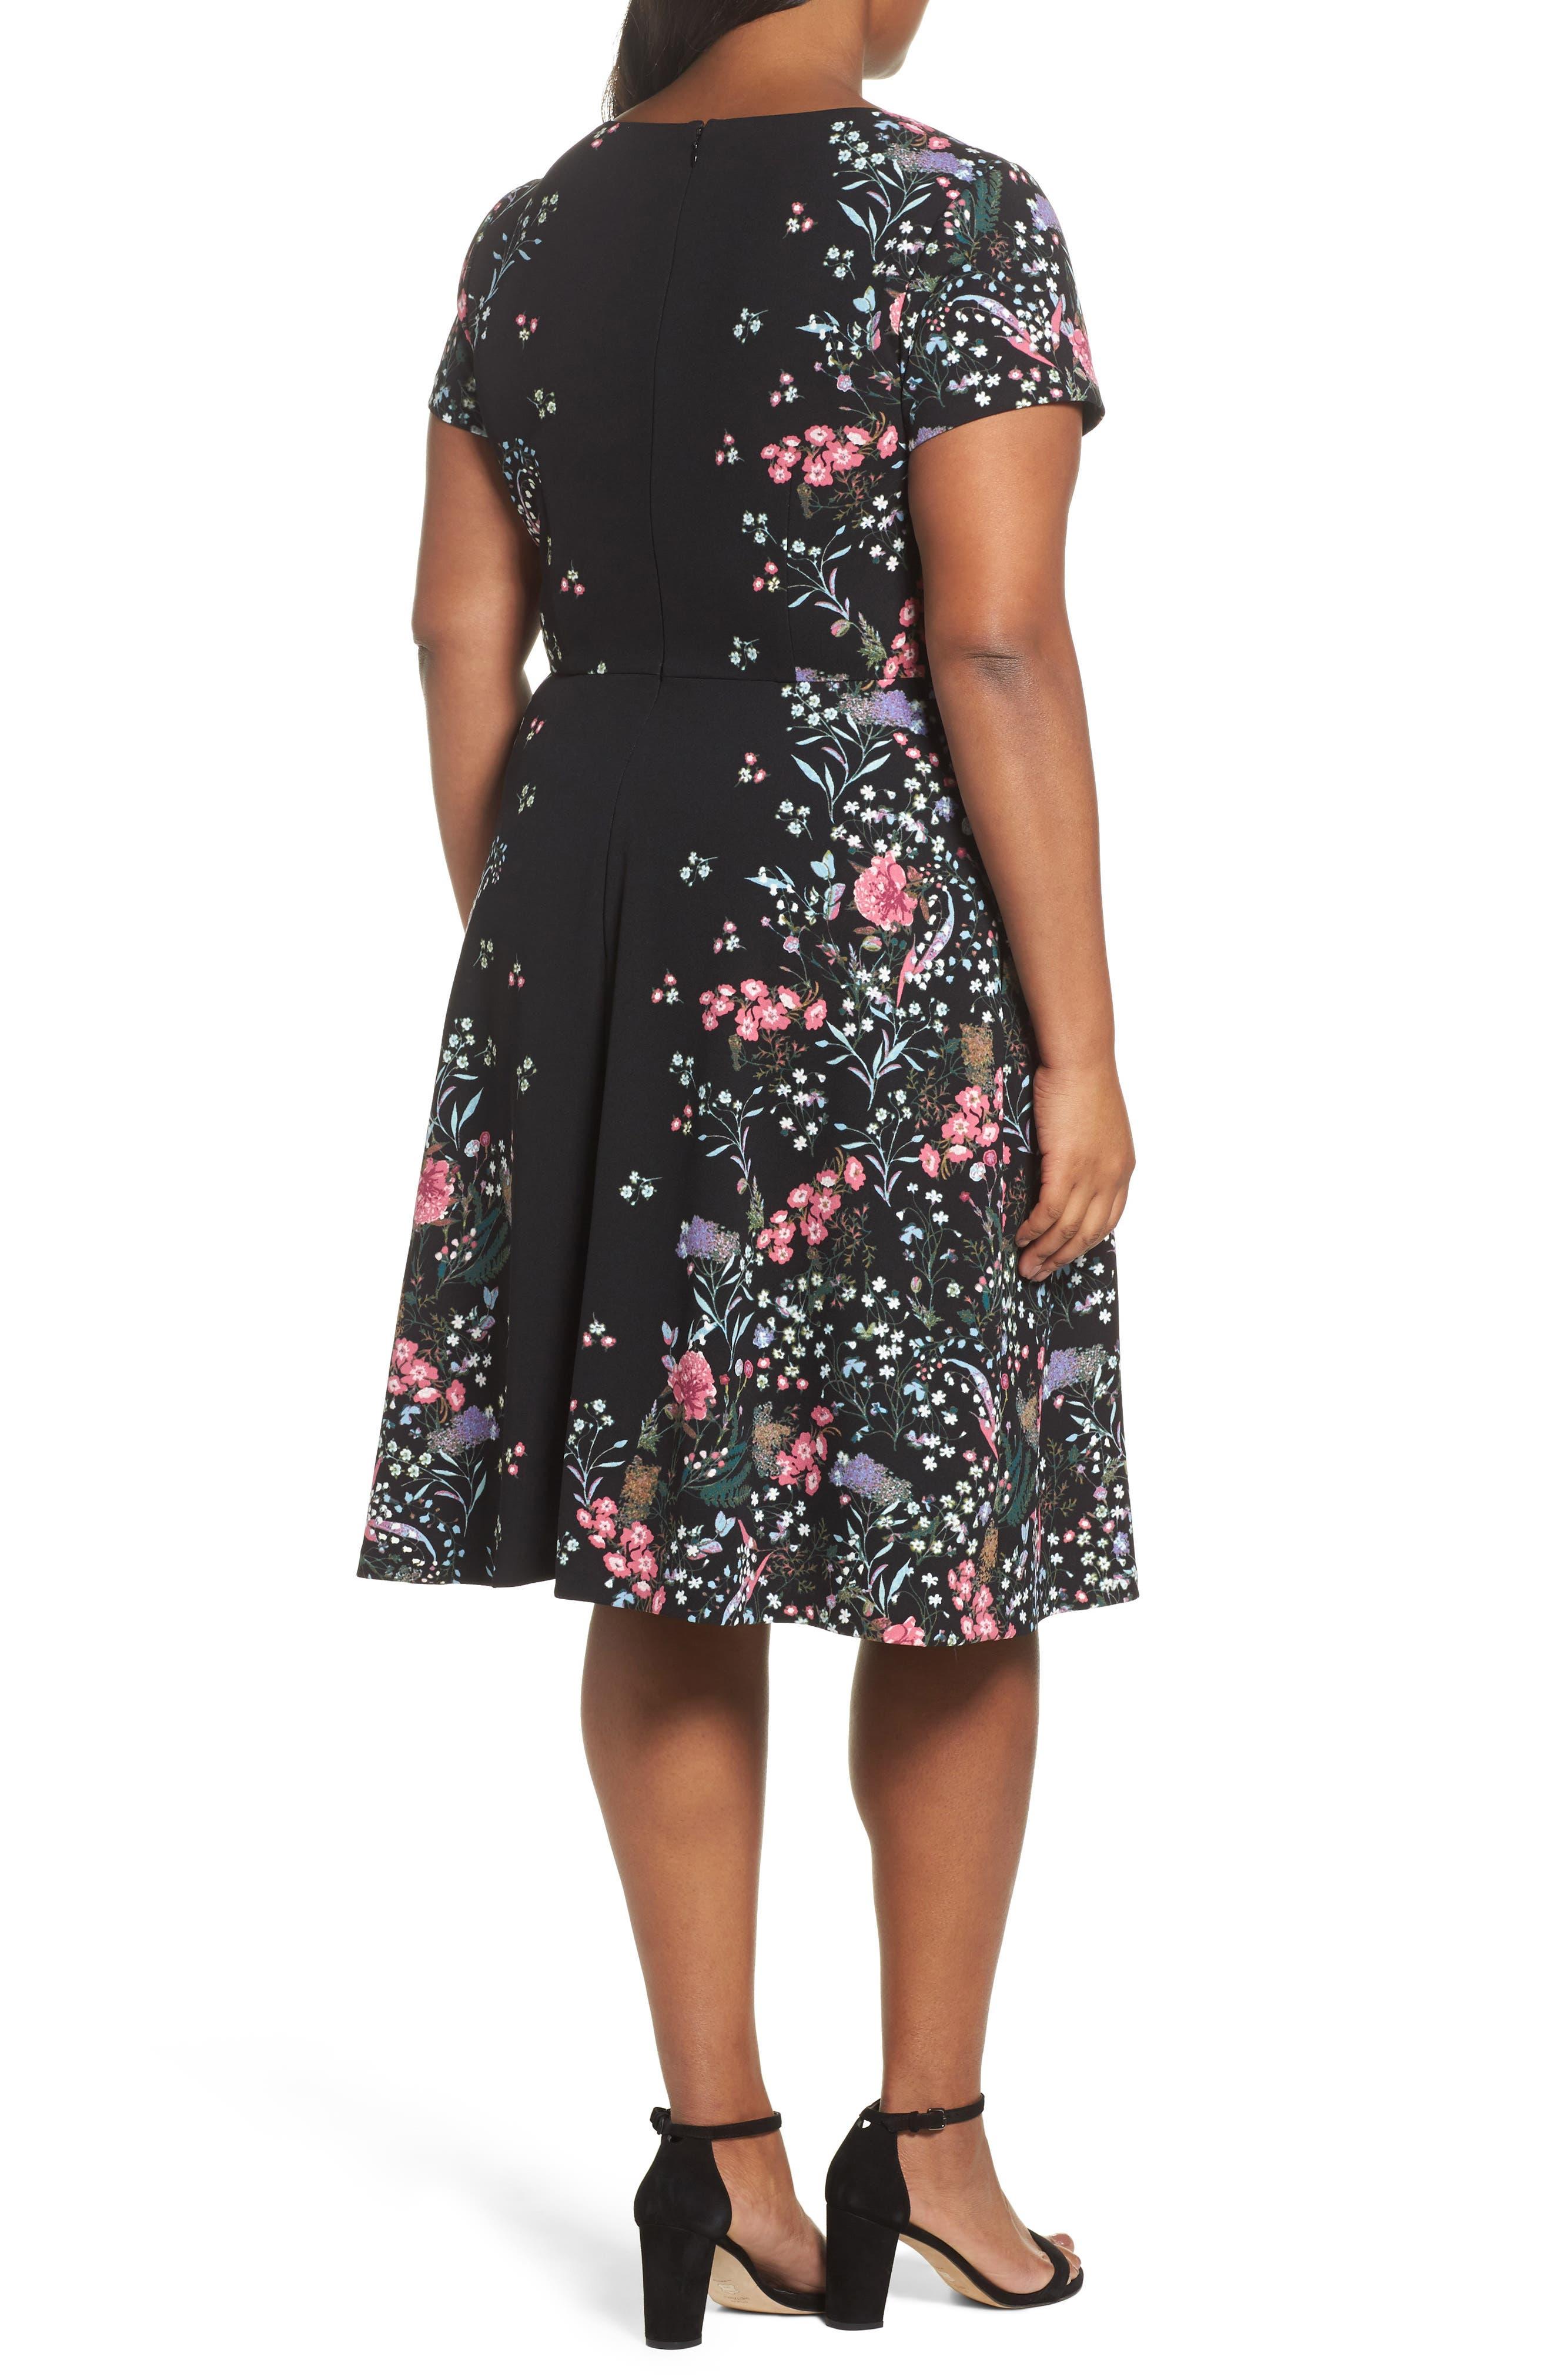 Alternate Image 2  - Adrianna Papell Print Scuba Knit Fit & Flare Dress (Plus Size)